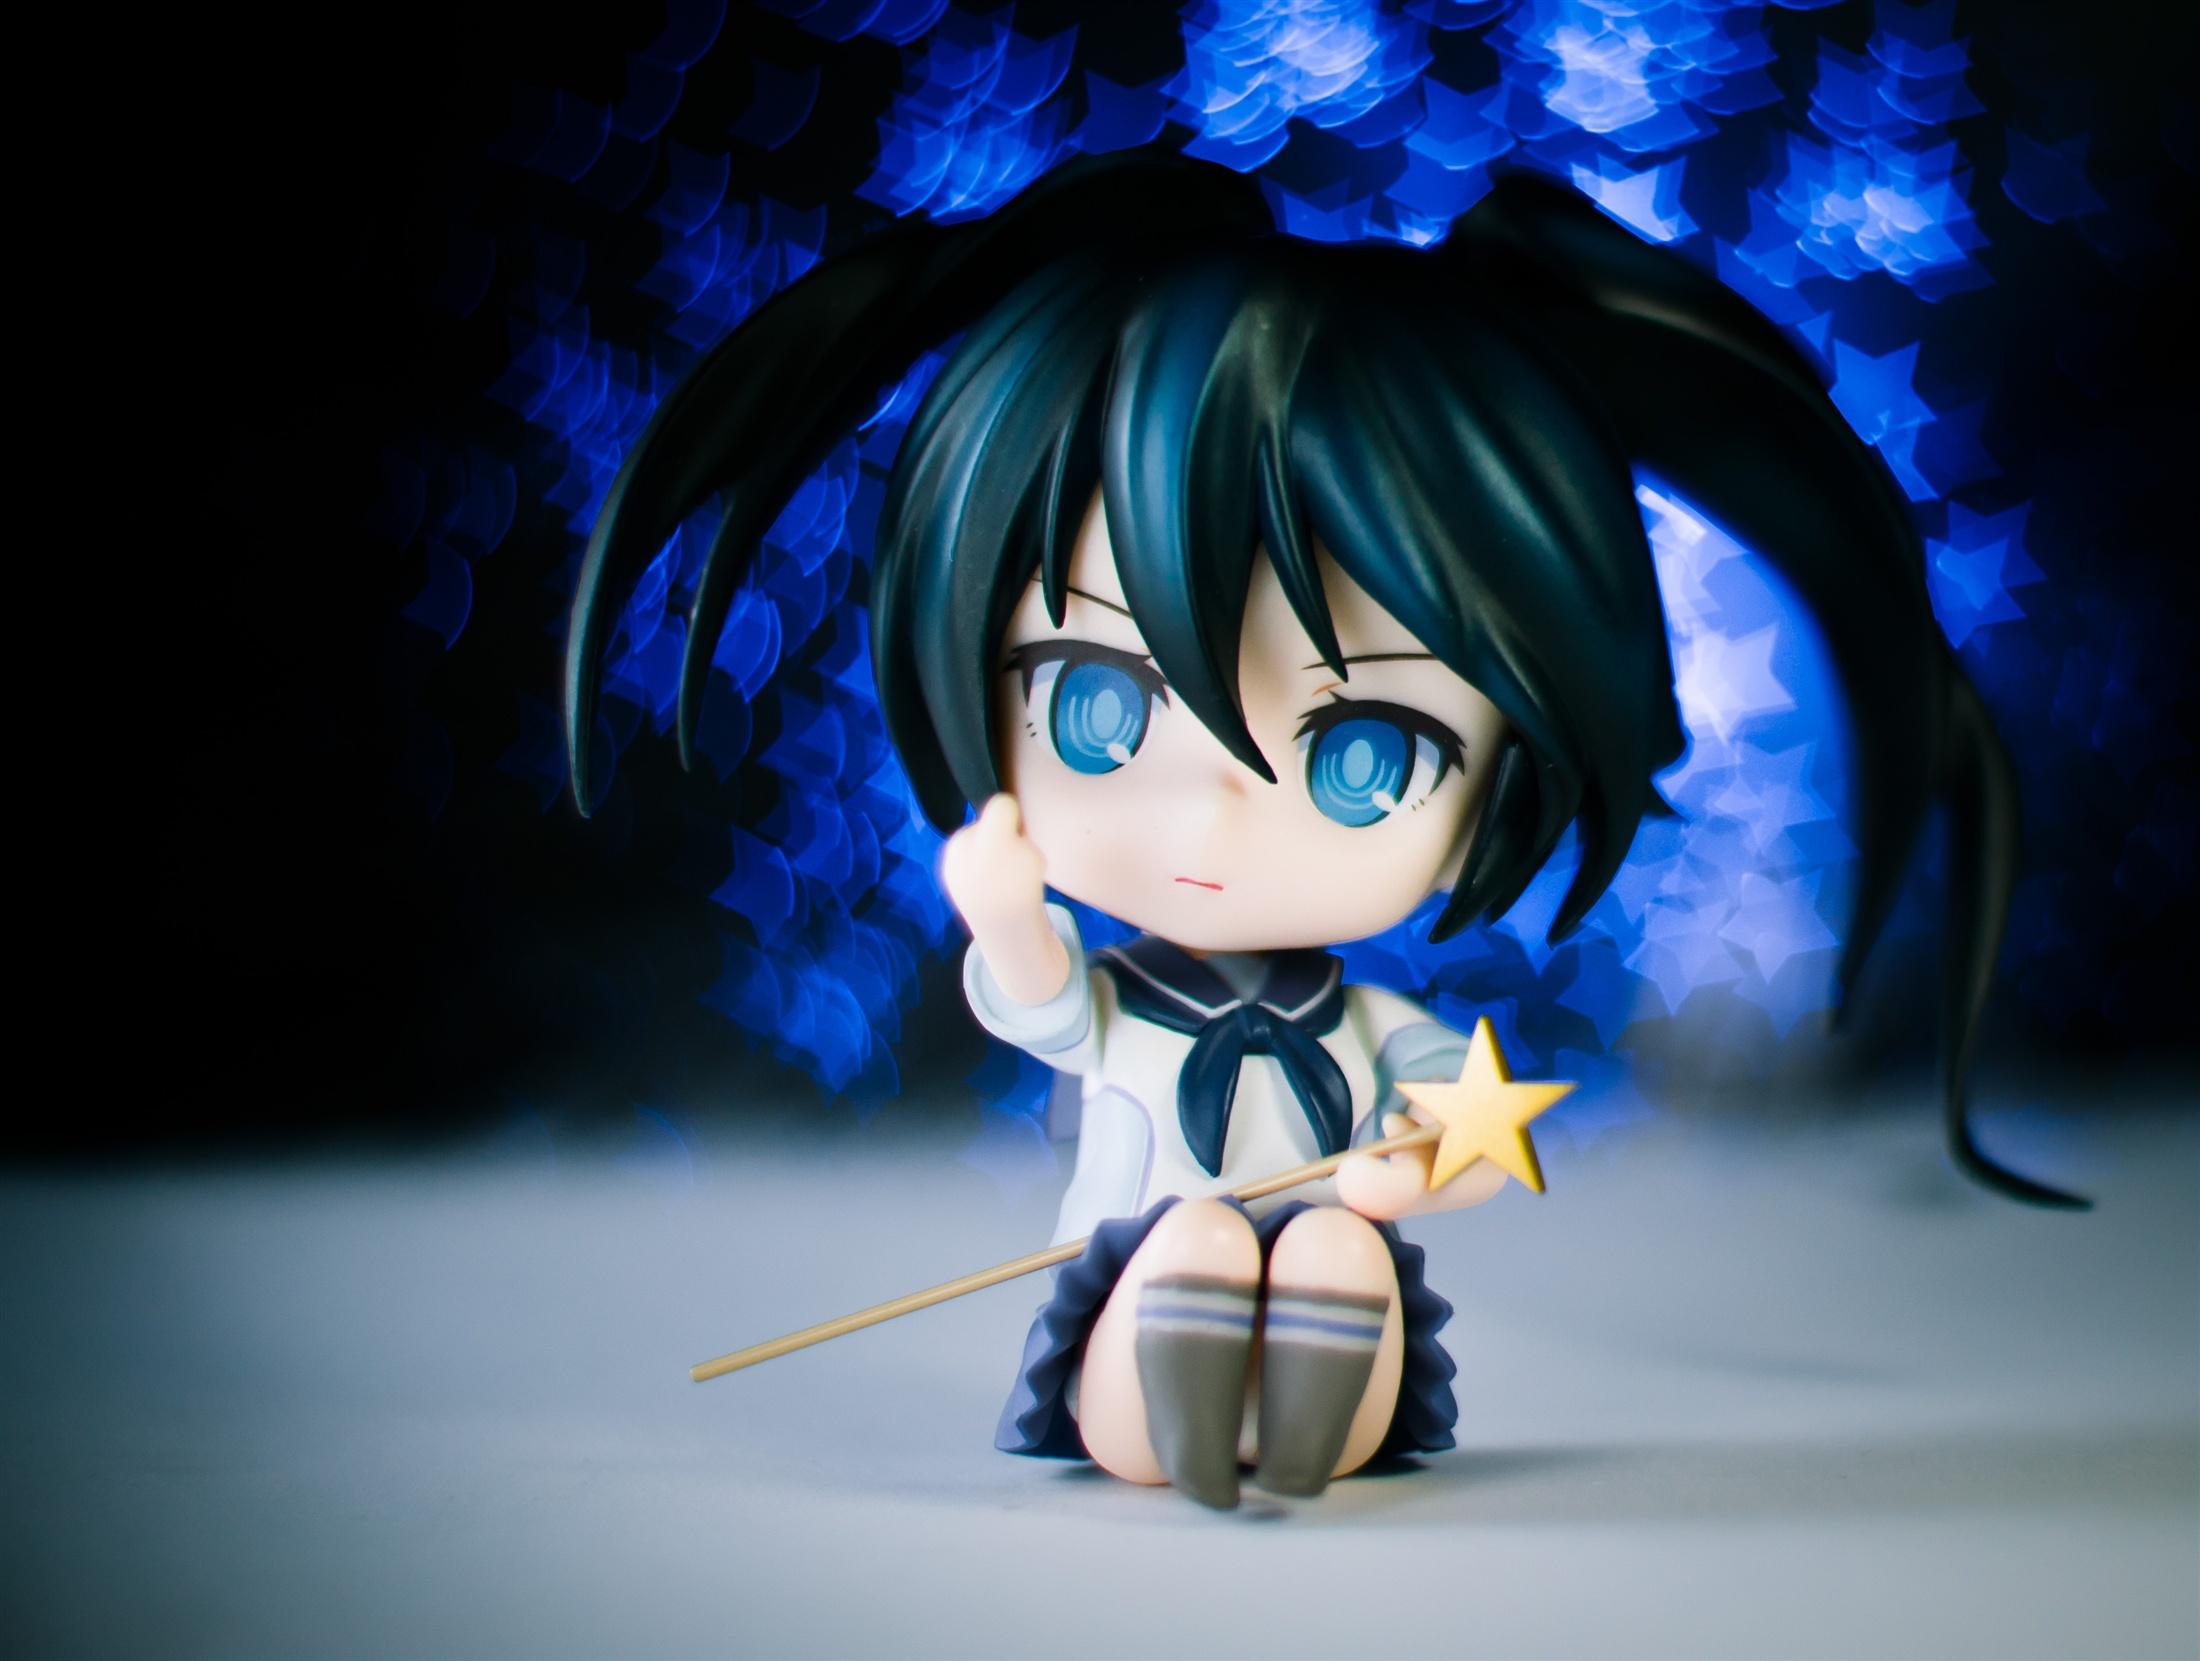 nendoroid good_smile_company love_plus takane_manaka amano_tooko bungaku_shoujo nendoron udono_kazuyoshi maruhige magical_marine_pixel_maritan mari-tan